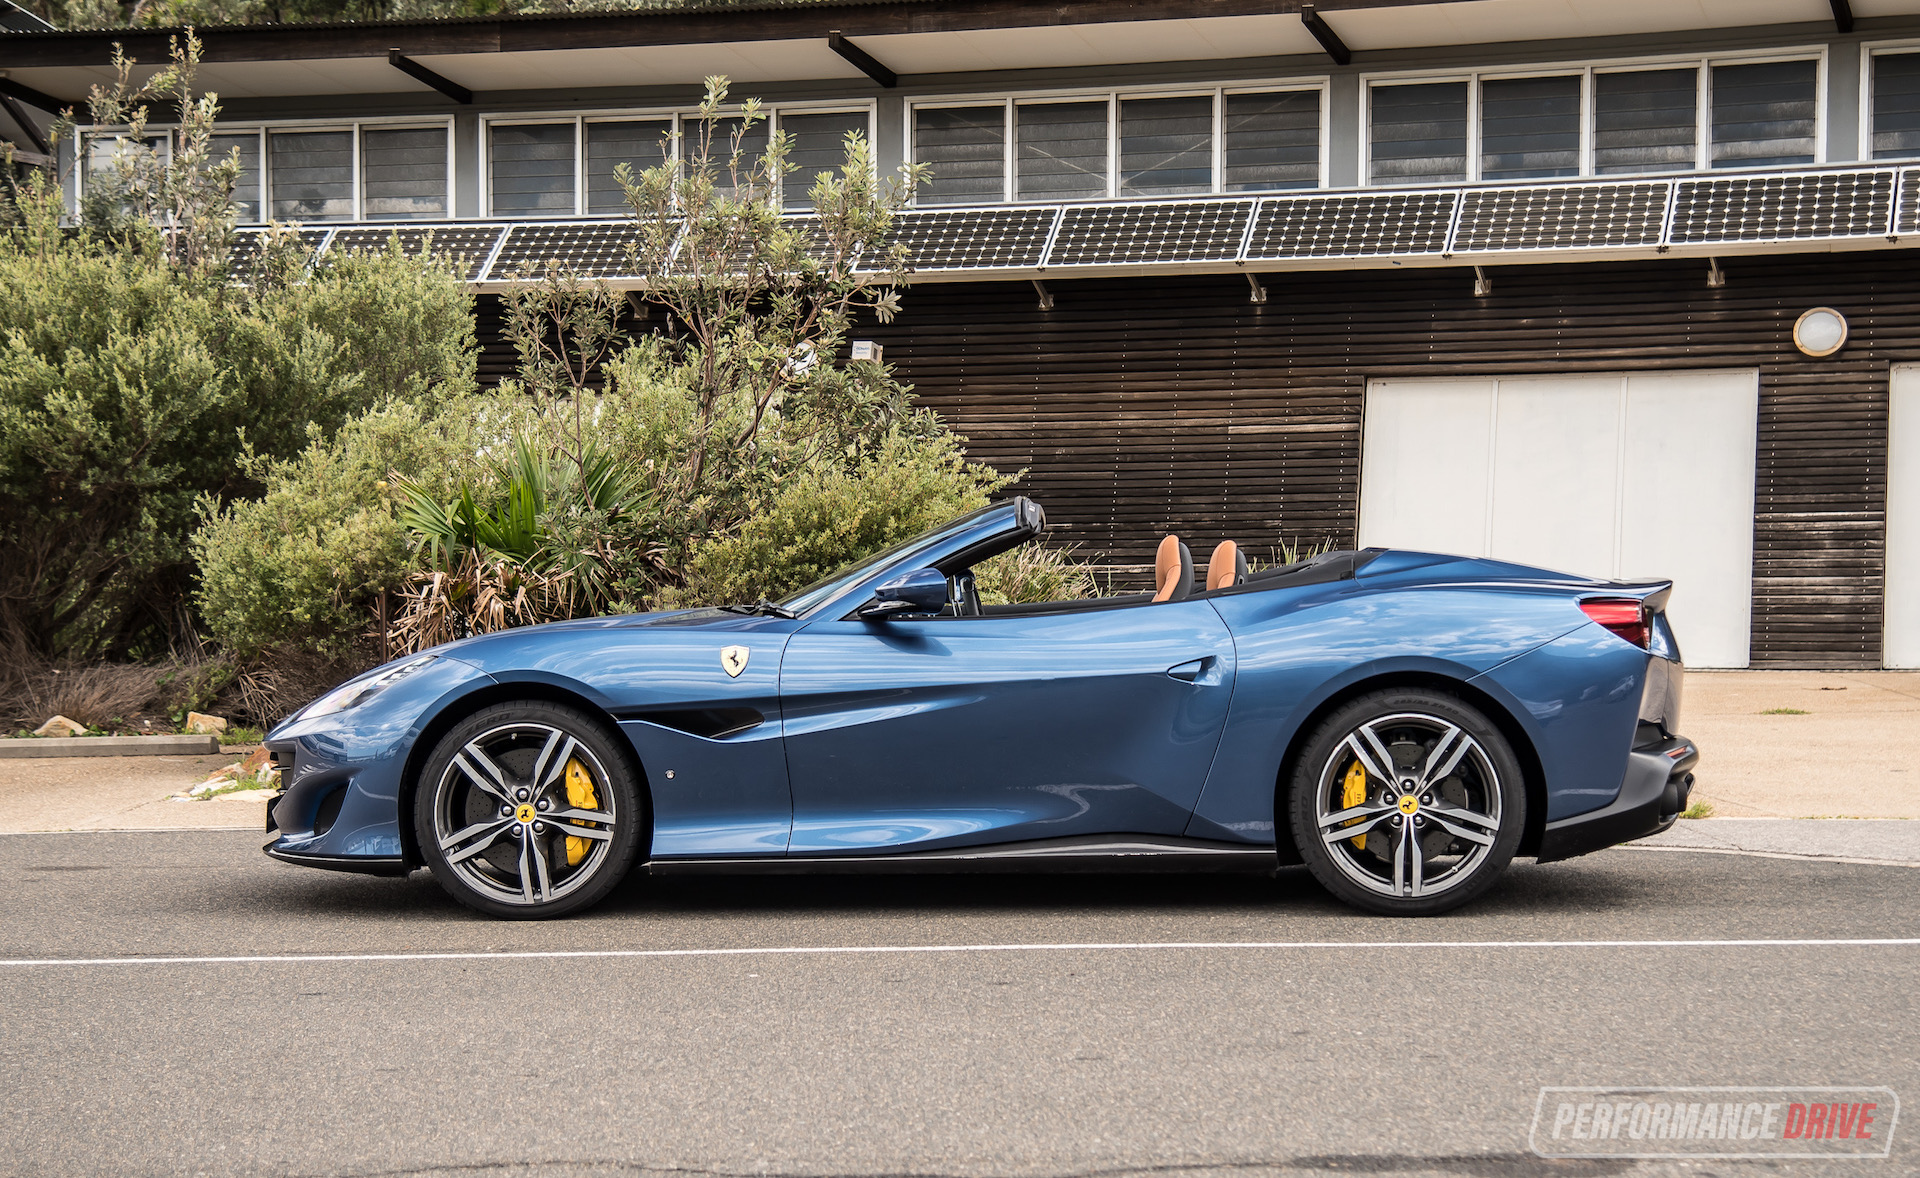 Harga Ferrari Portofino 2021 Inspirations 24 Head Quarters Auto